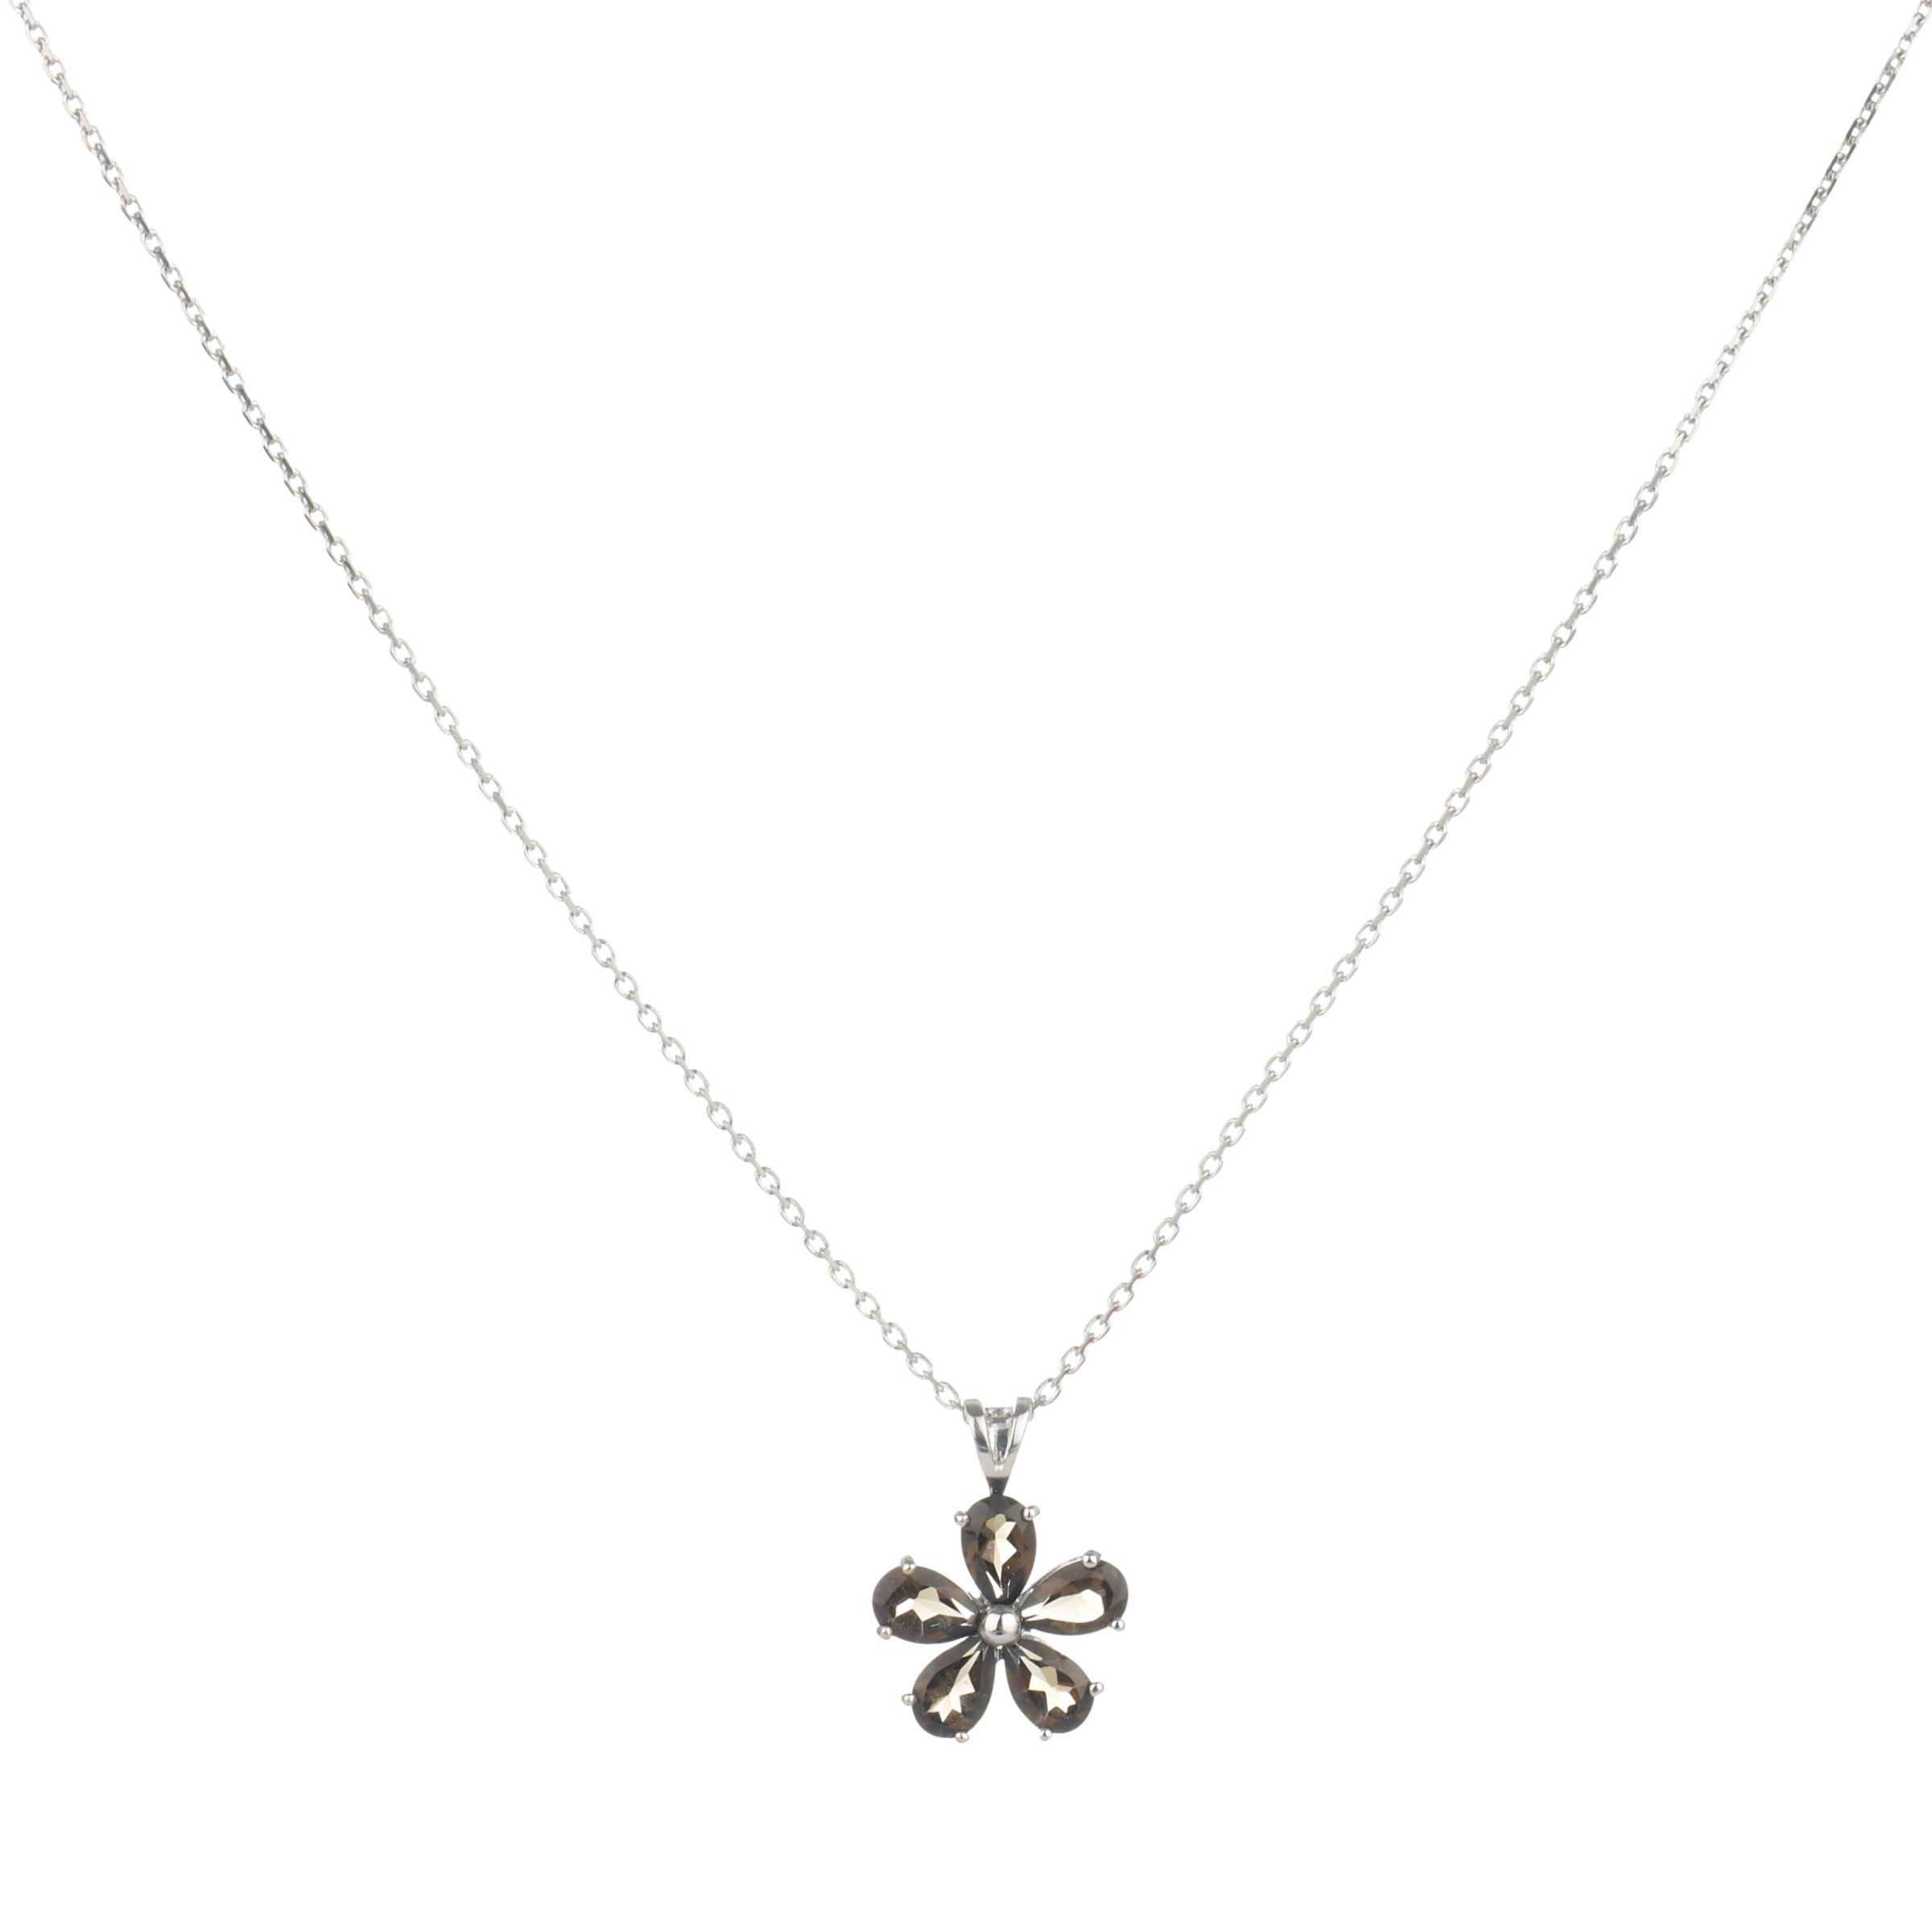 9ct White Gold Smokey Quartz Daisy Pendant Necklace